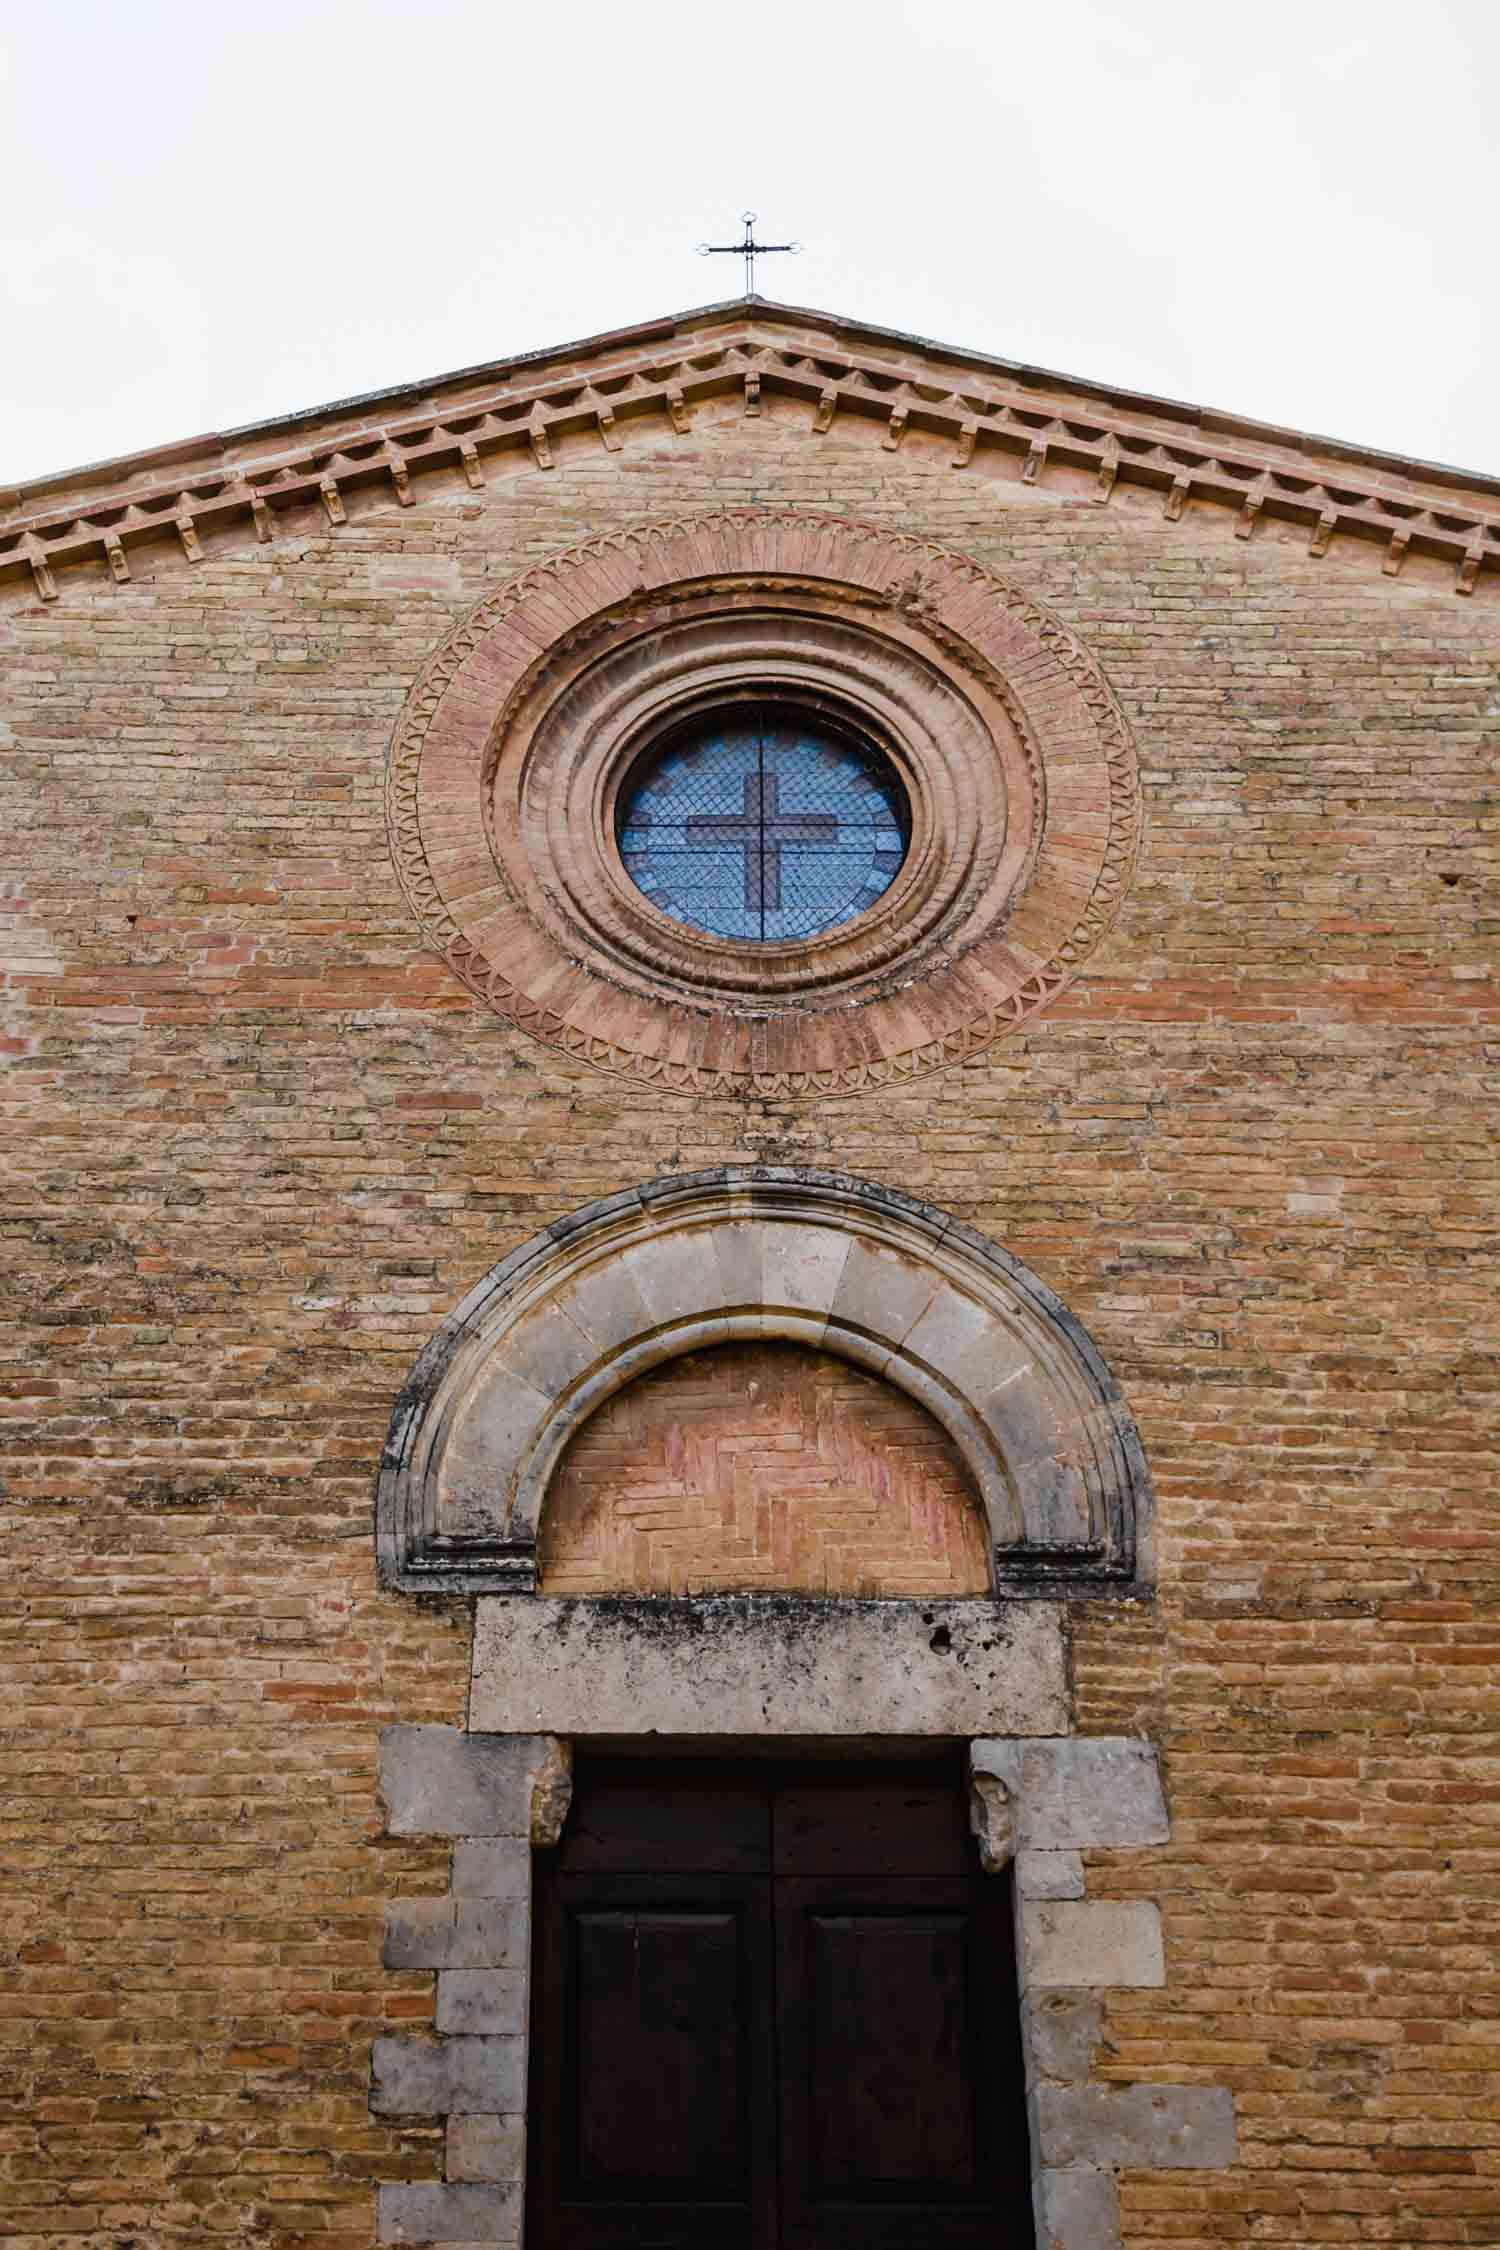 A church in San Gimignano, Italy, #tuscany #travel #italy #italianfarmhouse #olivegroves #travelphotography #vineyards #italyinautumn #beautifulitaly #vegantravel #italytravel #veganitaly #vegantuscany #veganhotel #ecotourism #organichotel #veganhotel #veganretreat #veganbedandbreakfast #sangimignano